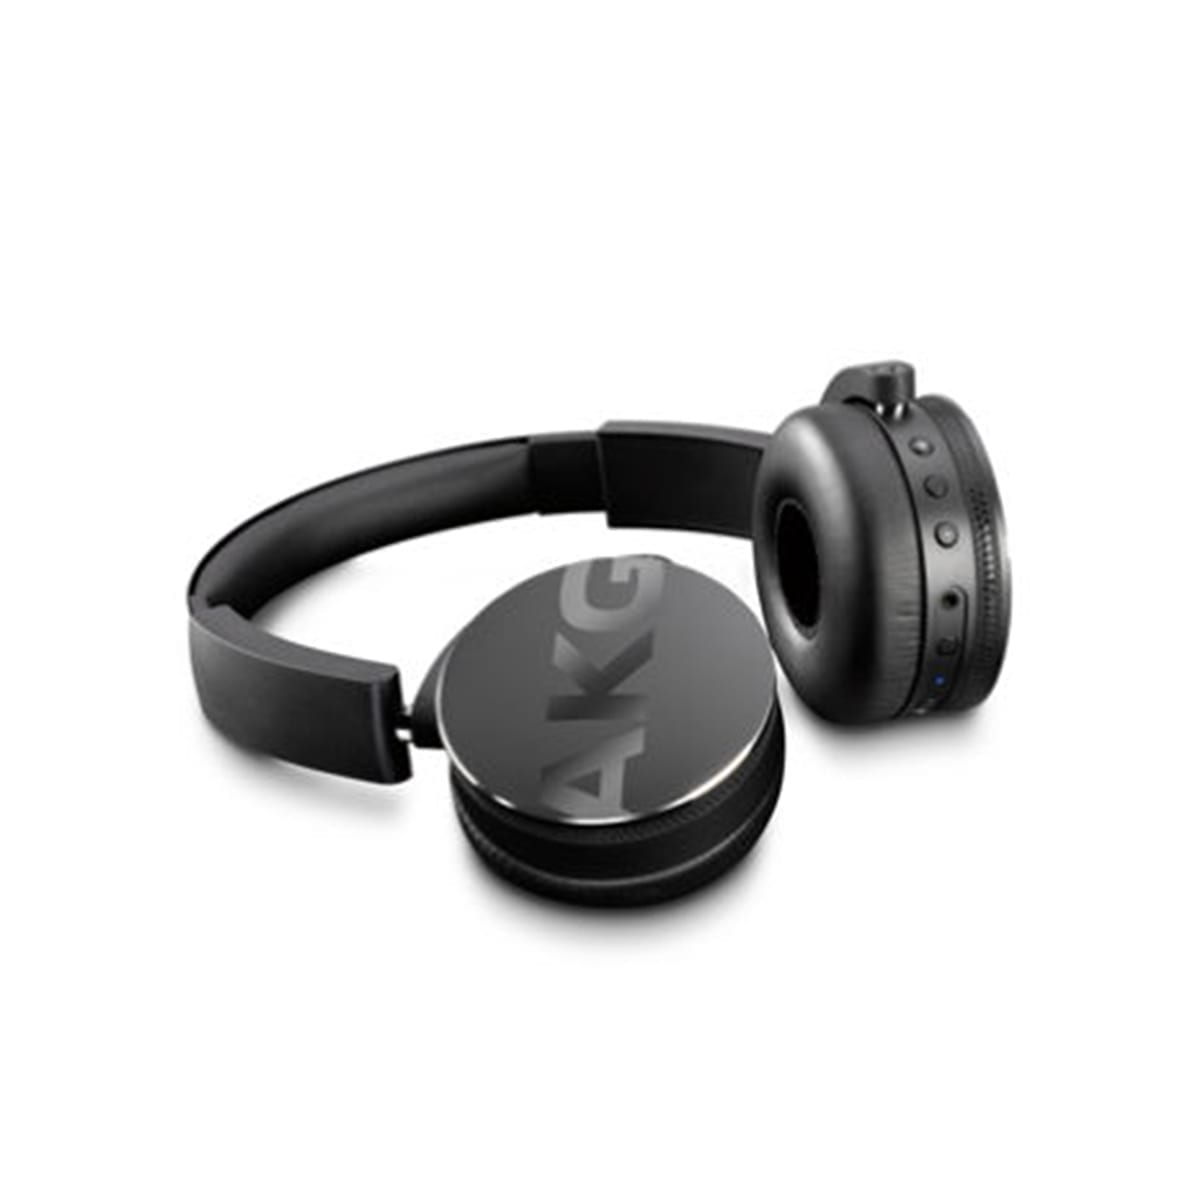 DJ Headphones Archives - Marshall Music ca56d13246